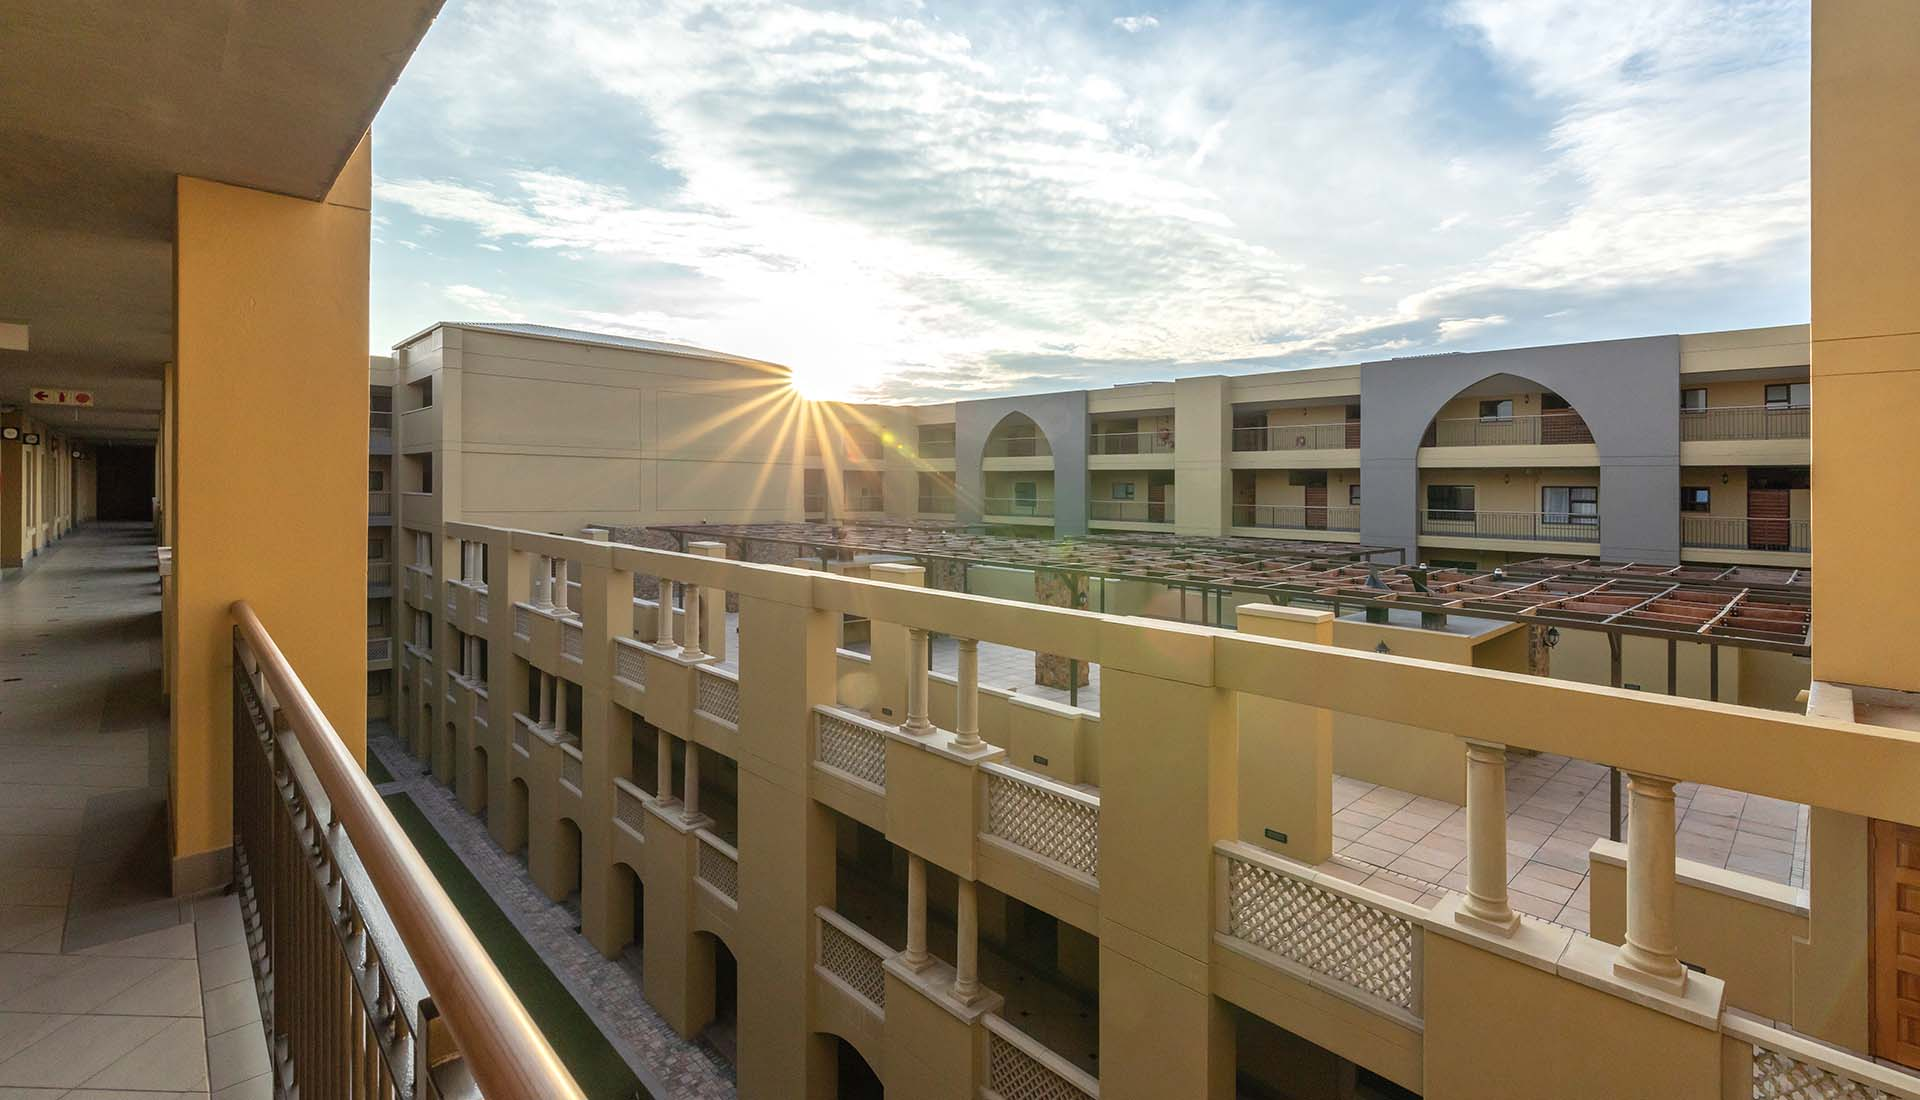 Architecture Photography, Al Qasr Sandton